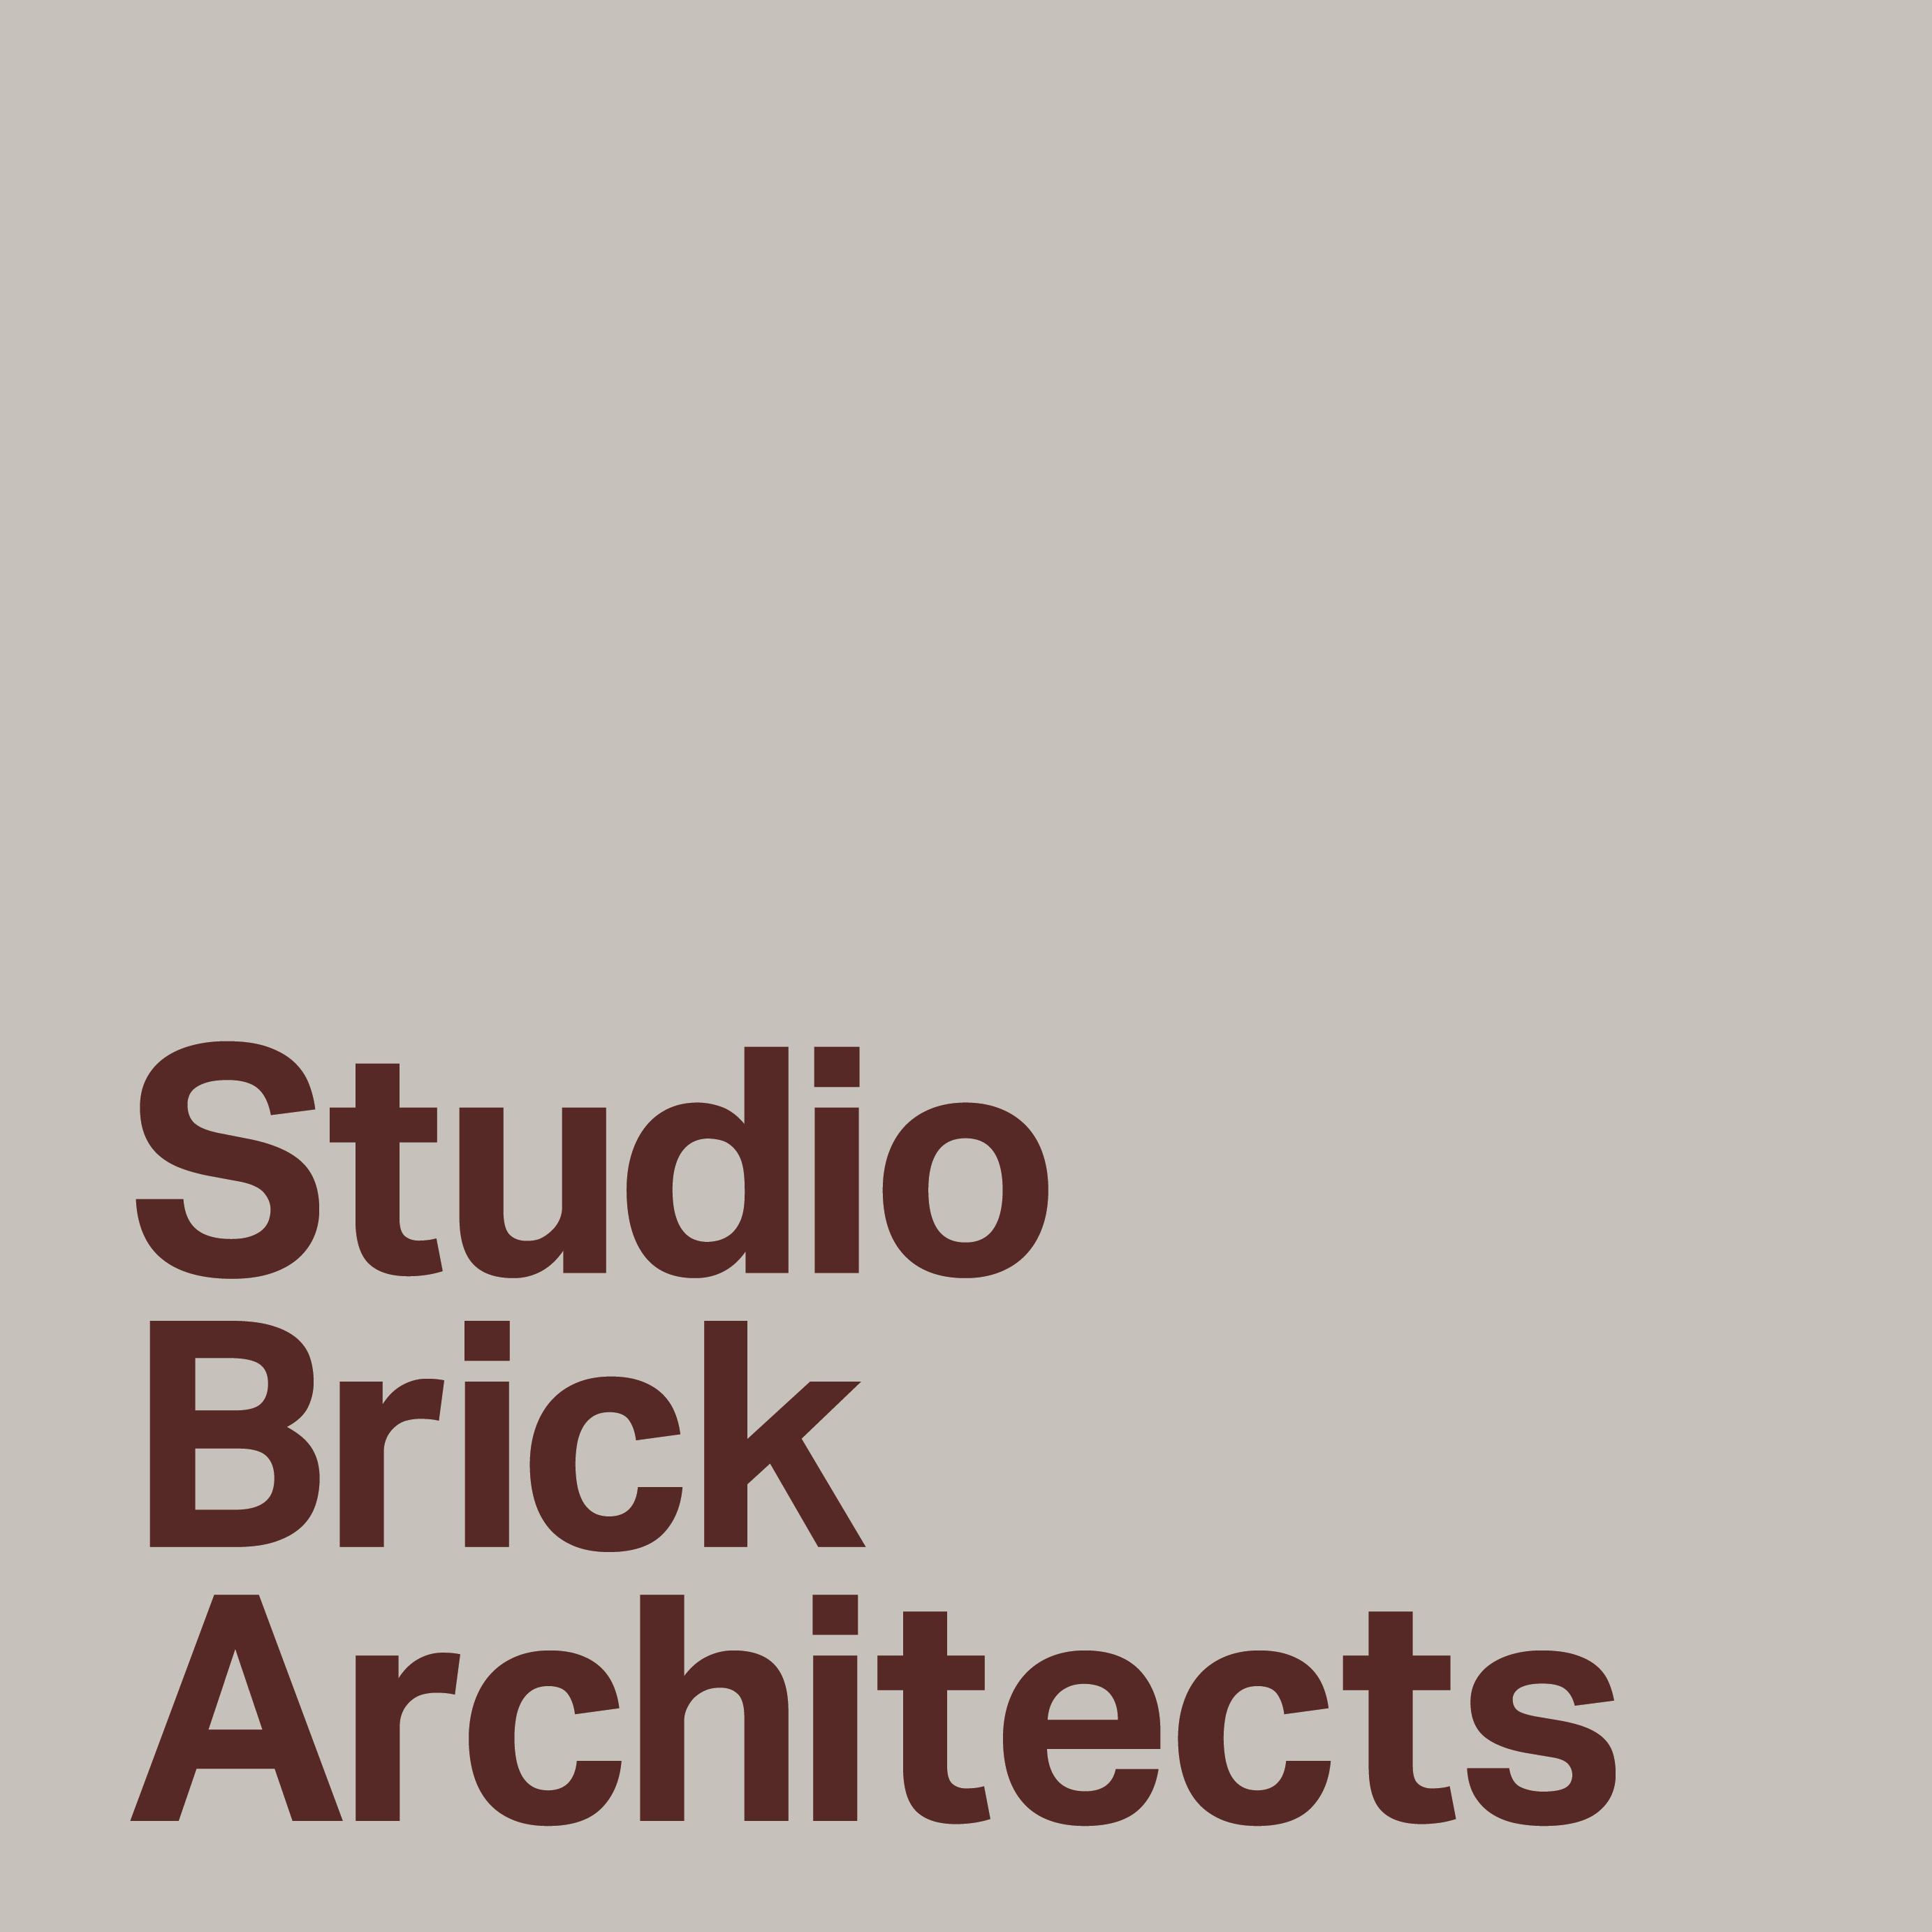 Studio Brick Architects Limited